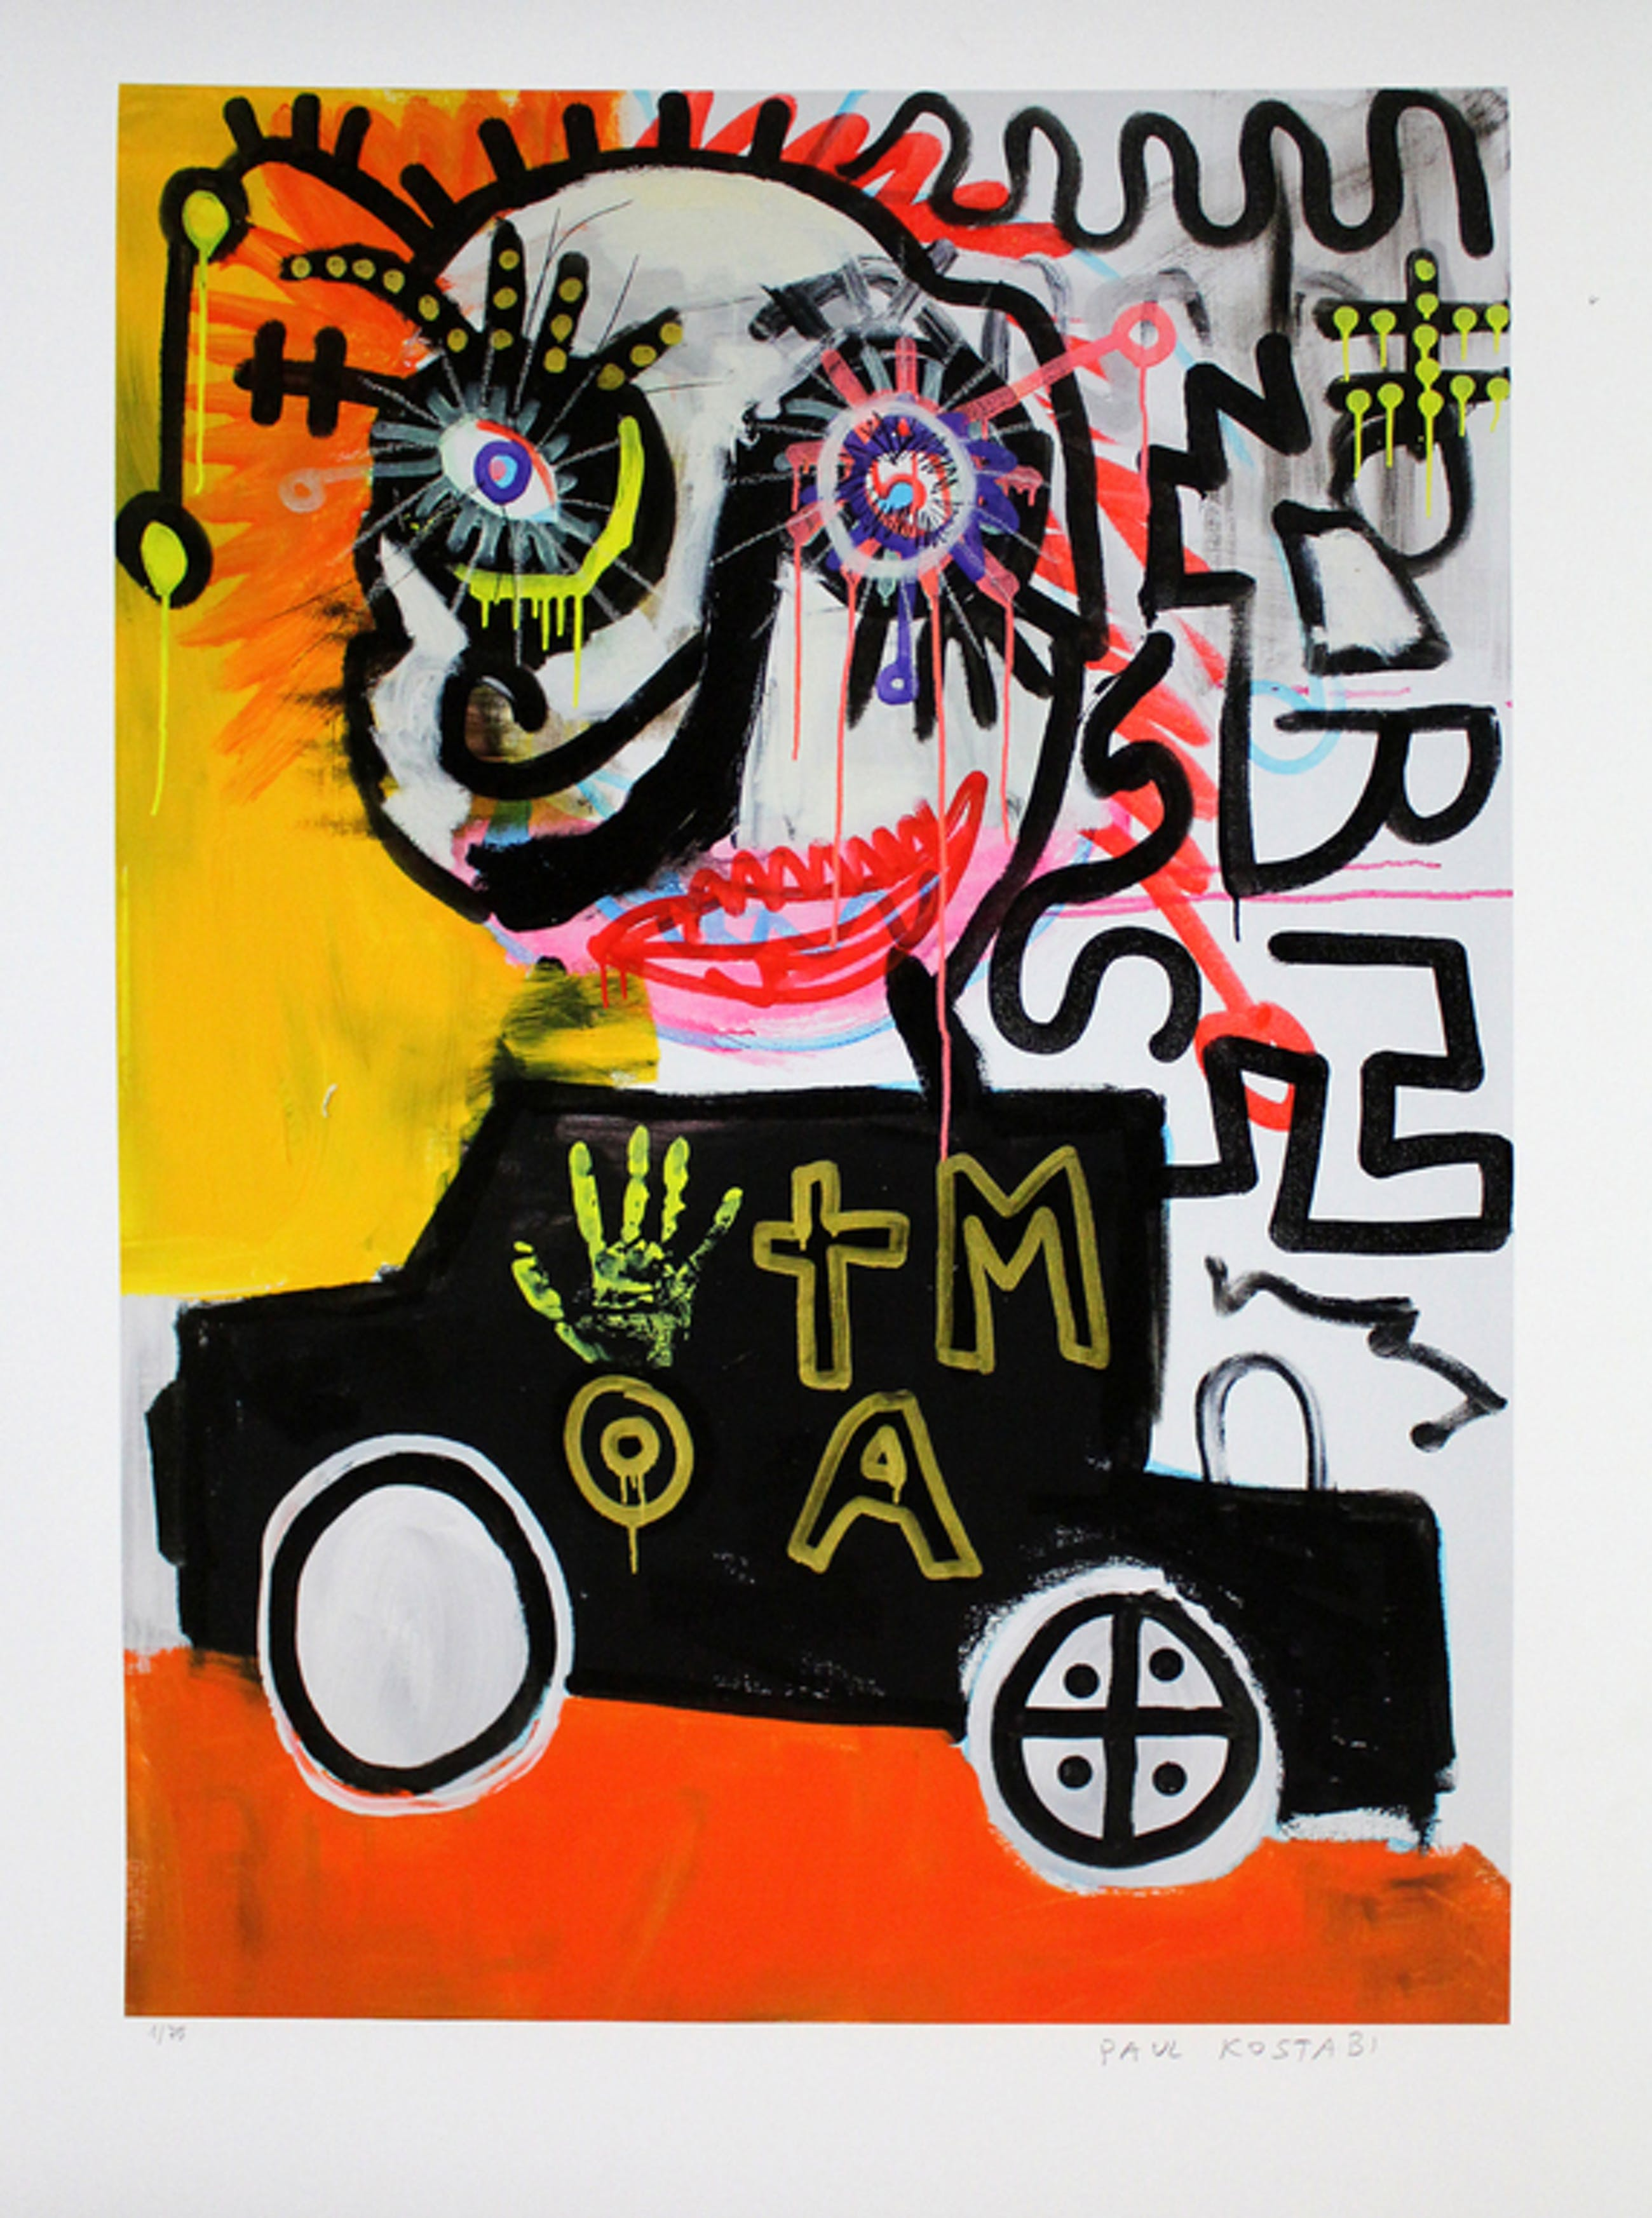 PAUL KOSTABI  Grote Giclee(84x61cm)   FUN DRIVE  Handgesigneerd kopen? Bied vanaf 65!